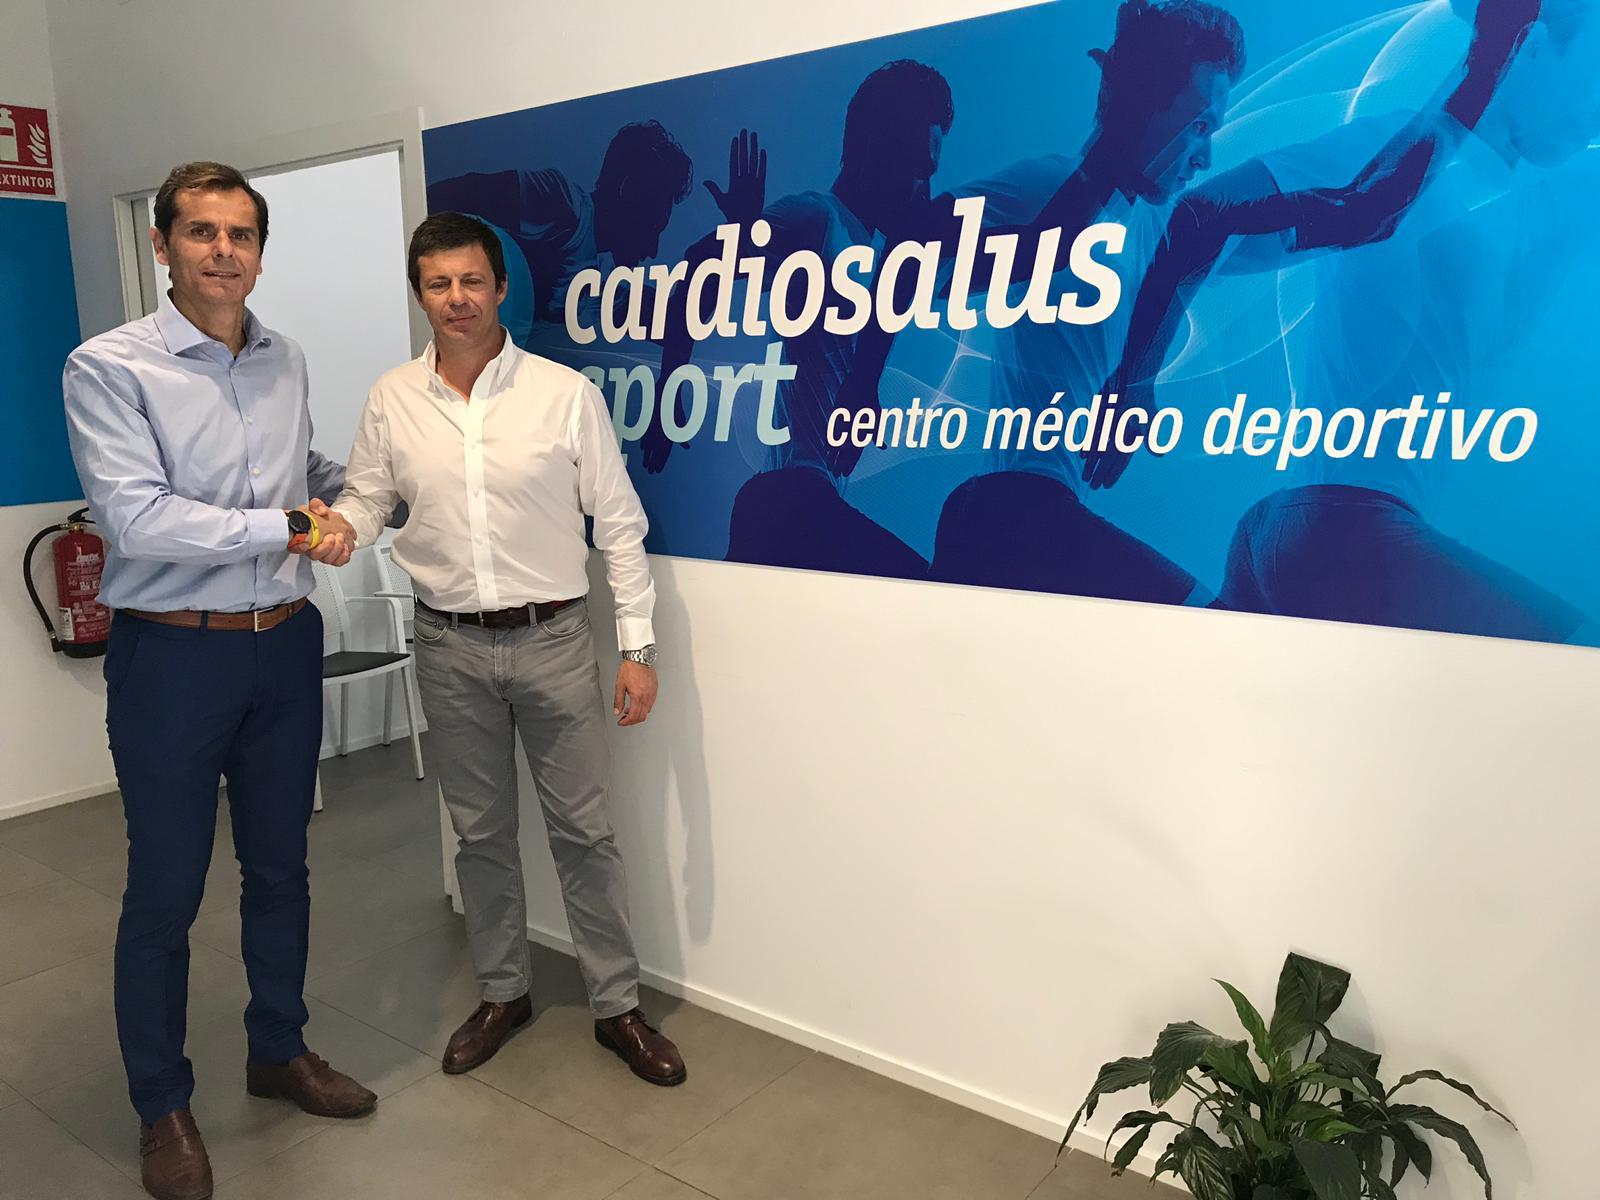 Convenio Cardiosalus Sport